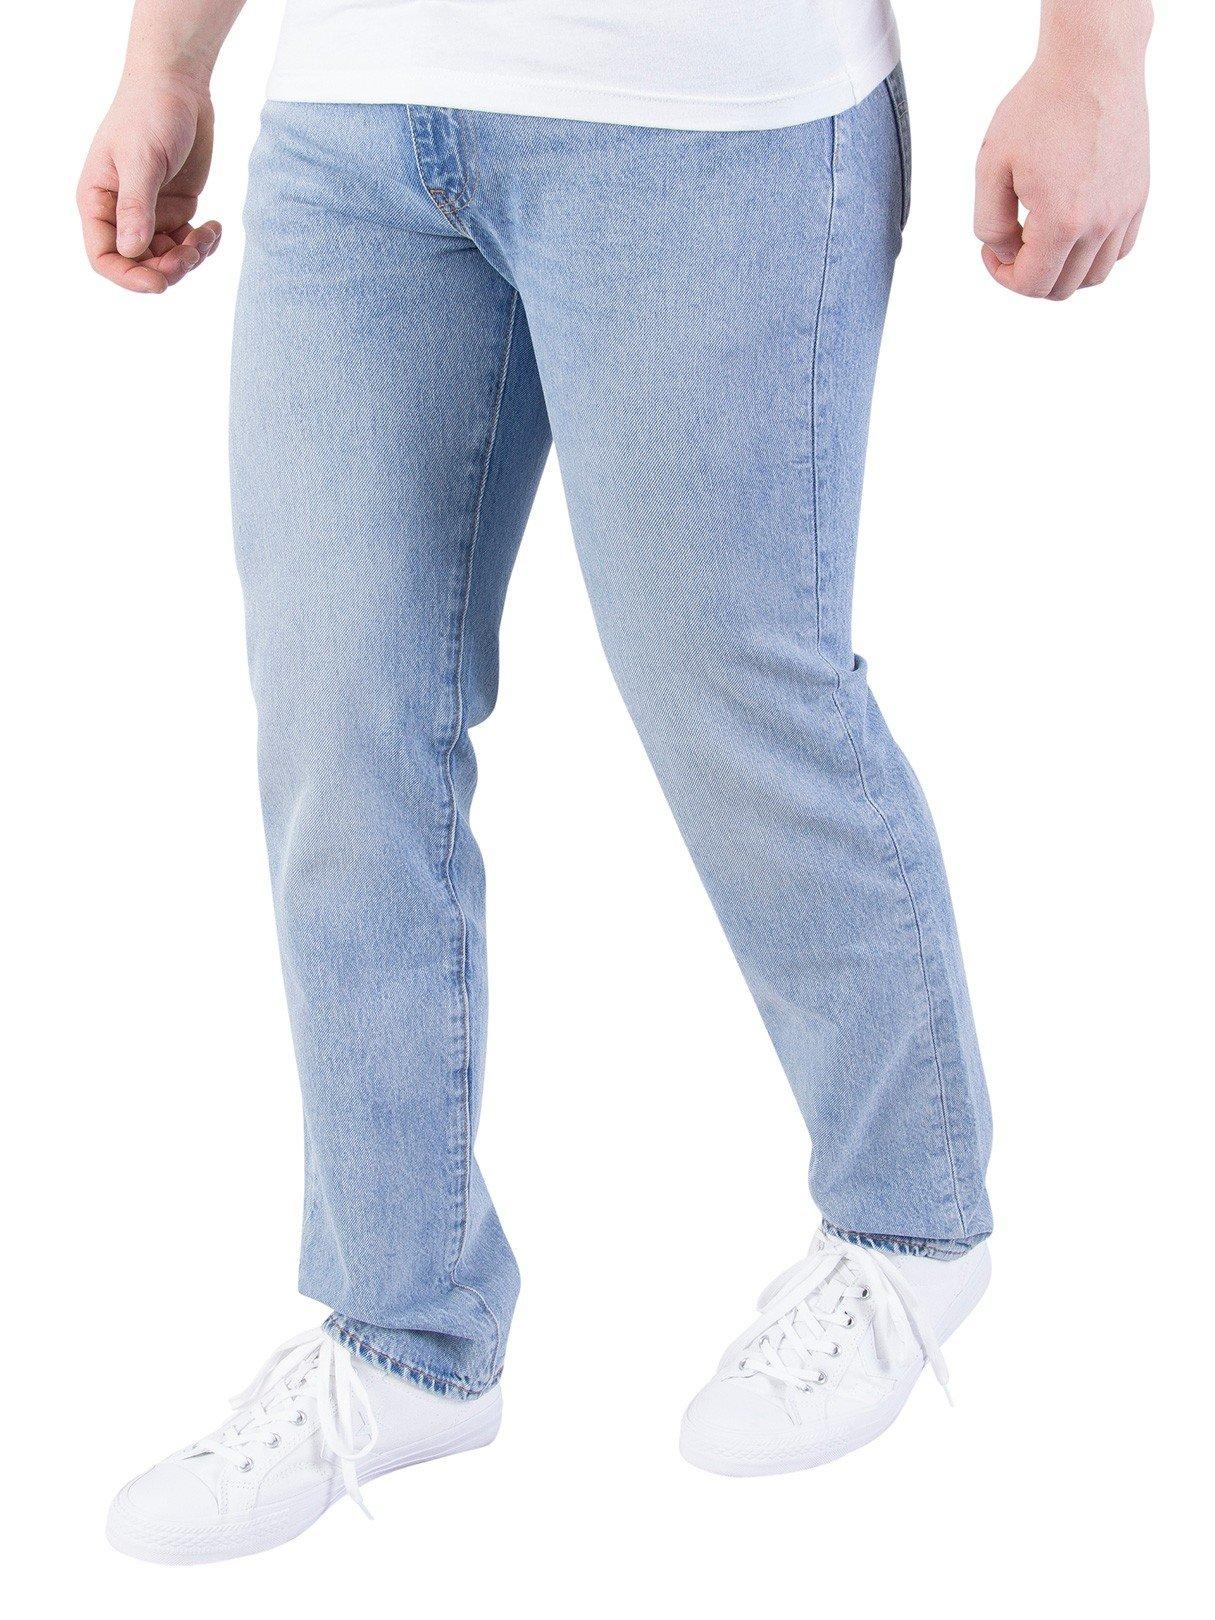 Levis 511 Slim Fit Jeans 32W x 34L Ocean Parkway Warp Str